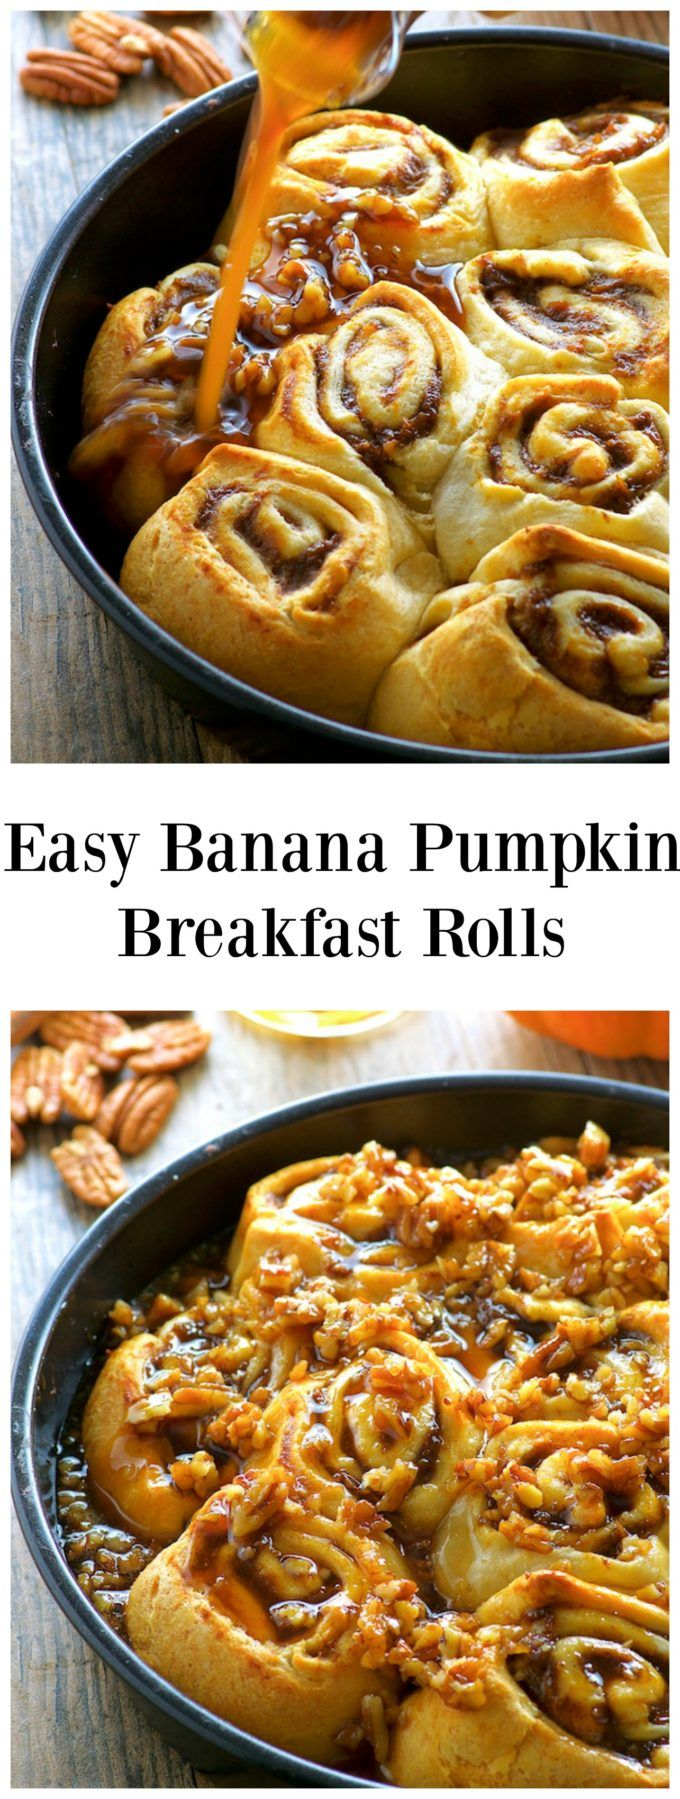 Easy Banana Pumpkin Breakfast Rolls via @ourpassio…